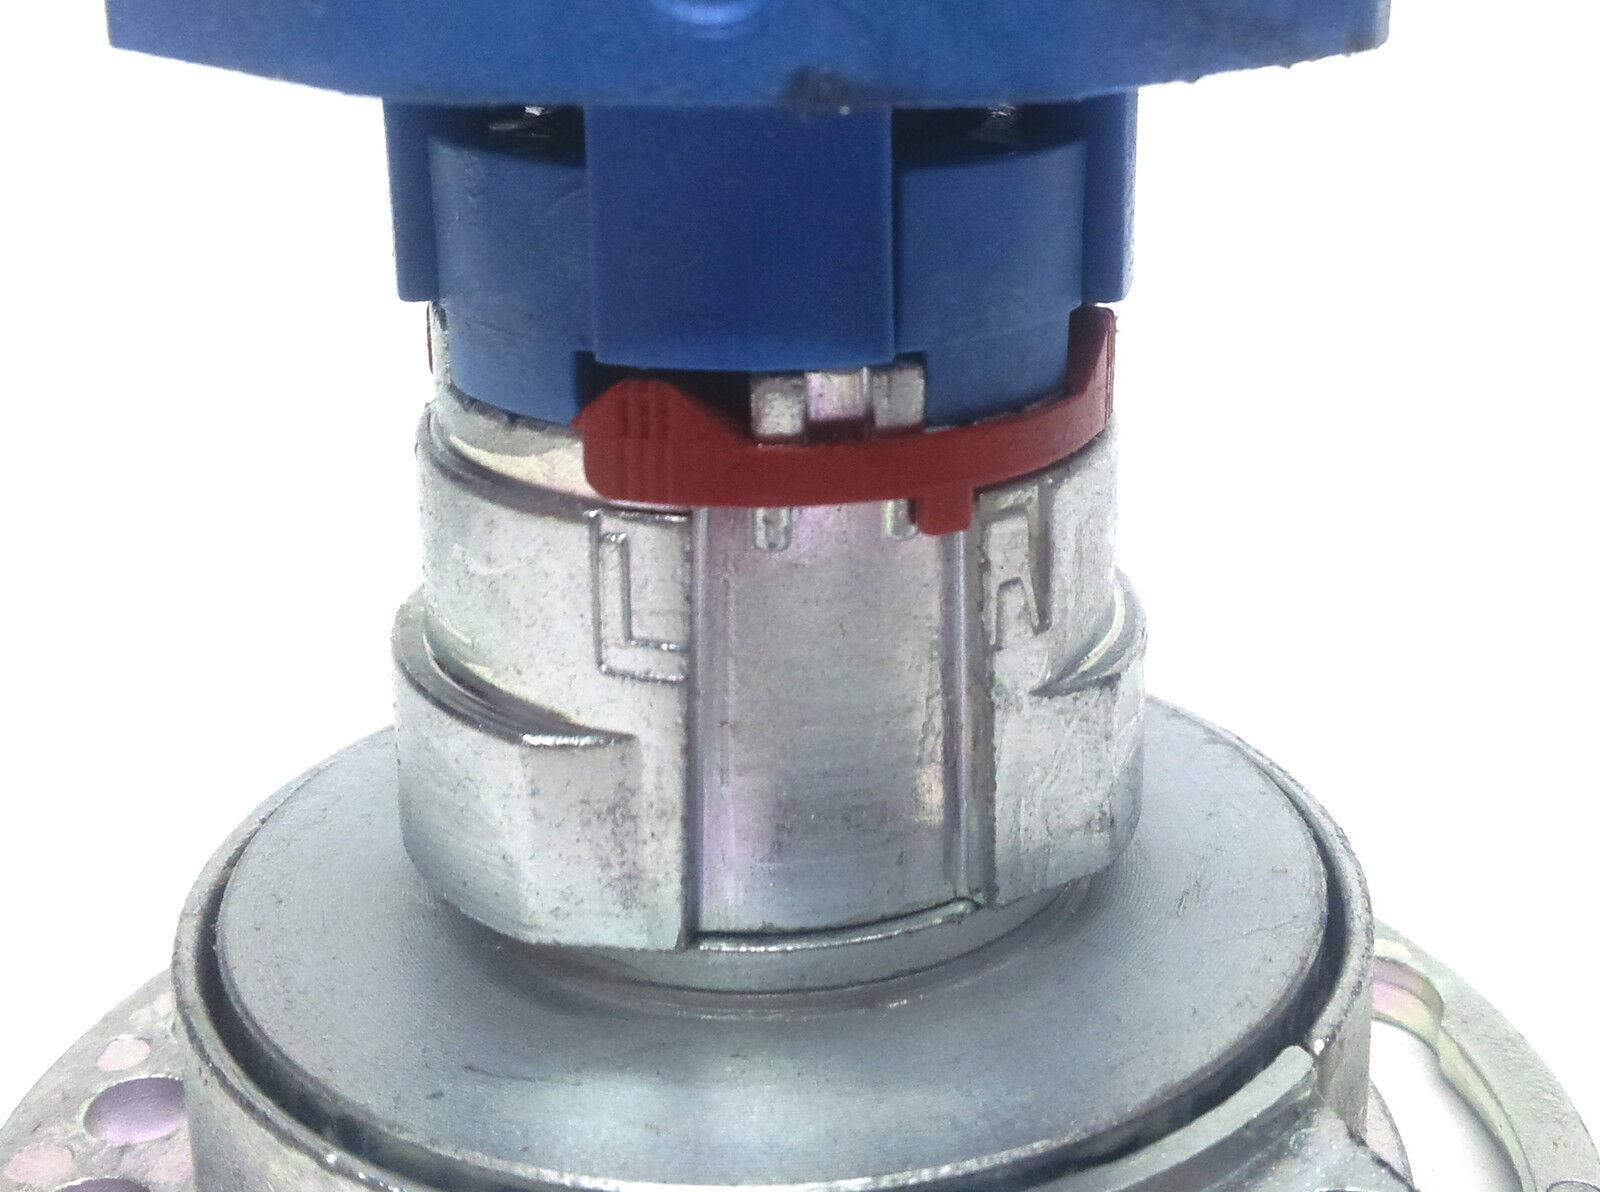 Kurbelgetriebe Kegelradgetriebe 2 1, 3 1, 4 1 L o o o R Umschaltbar SW40 Rolladen | Deutschland Shops  40e349